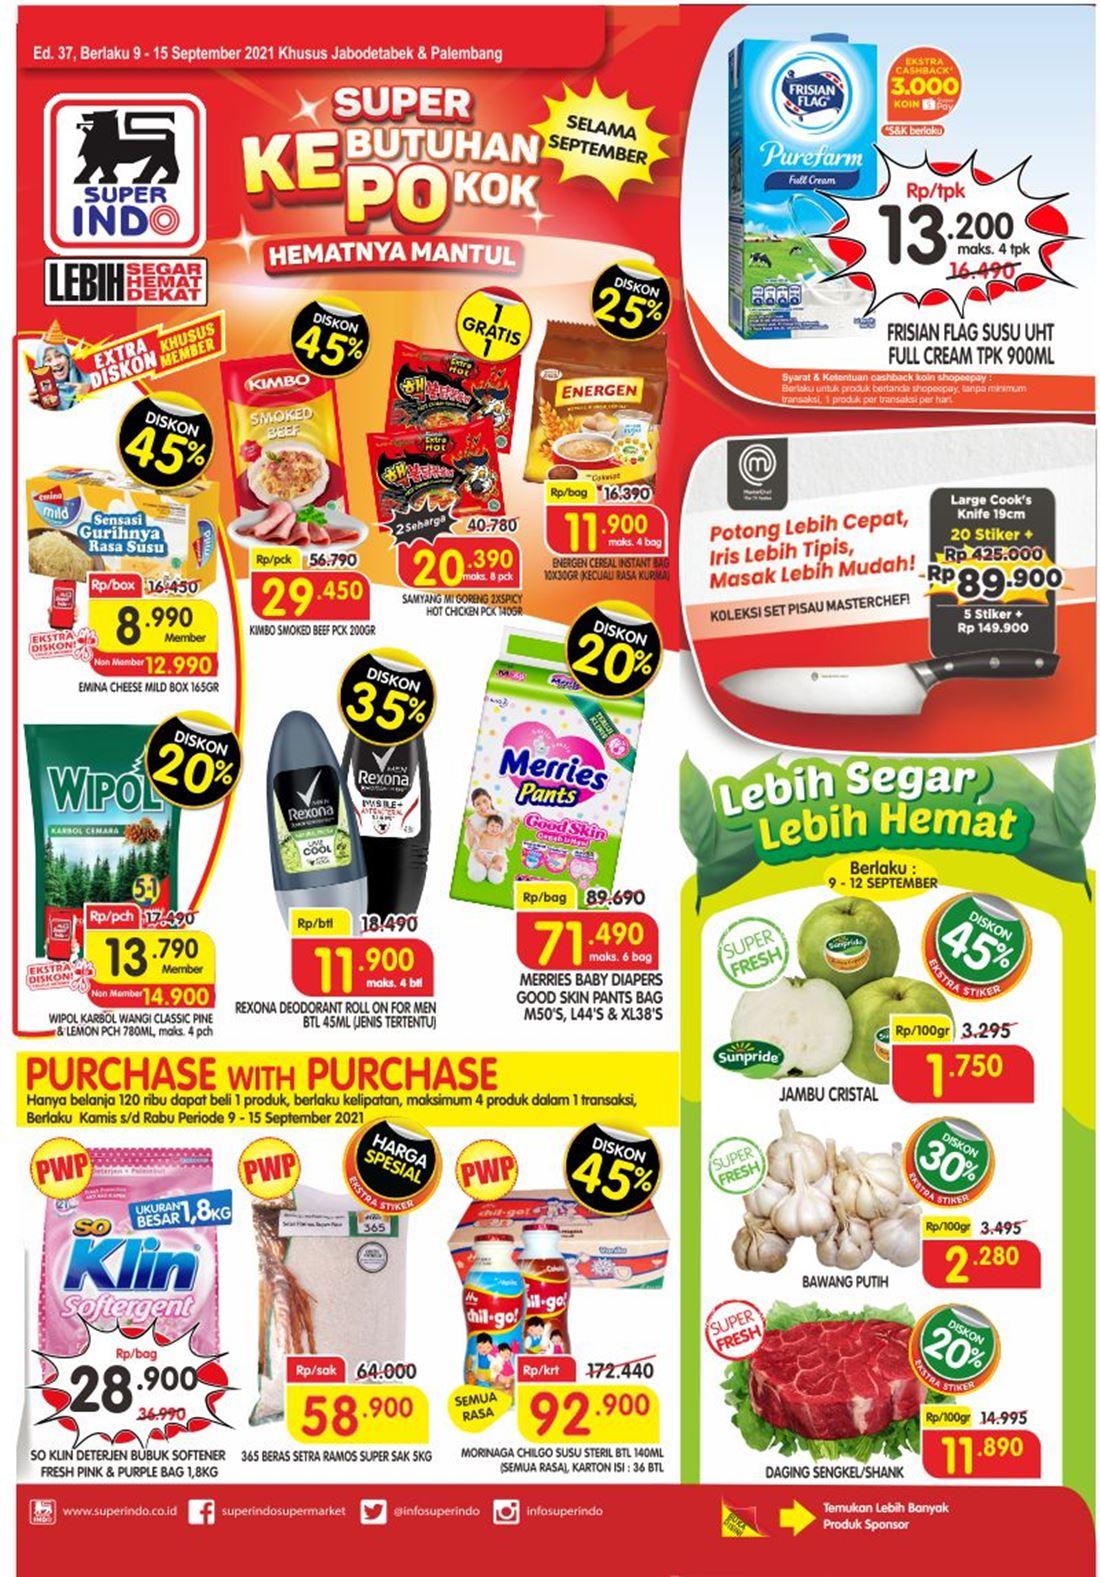 Katalog Superindo Promo Superindo Mingguan 09 - 15 September 2021